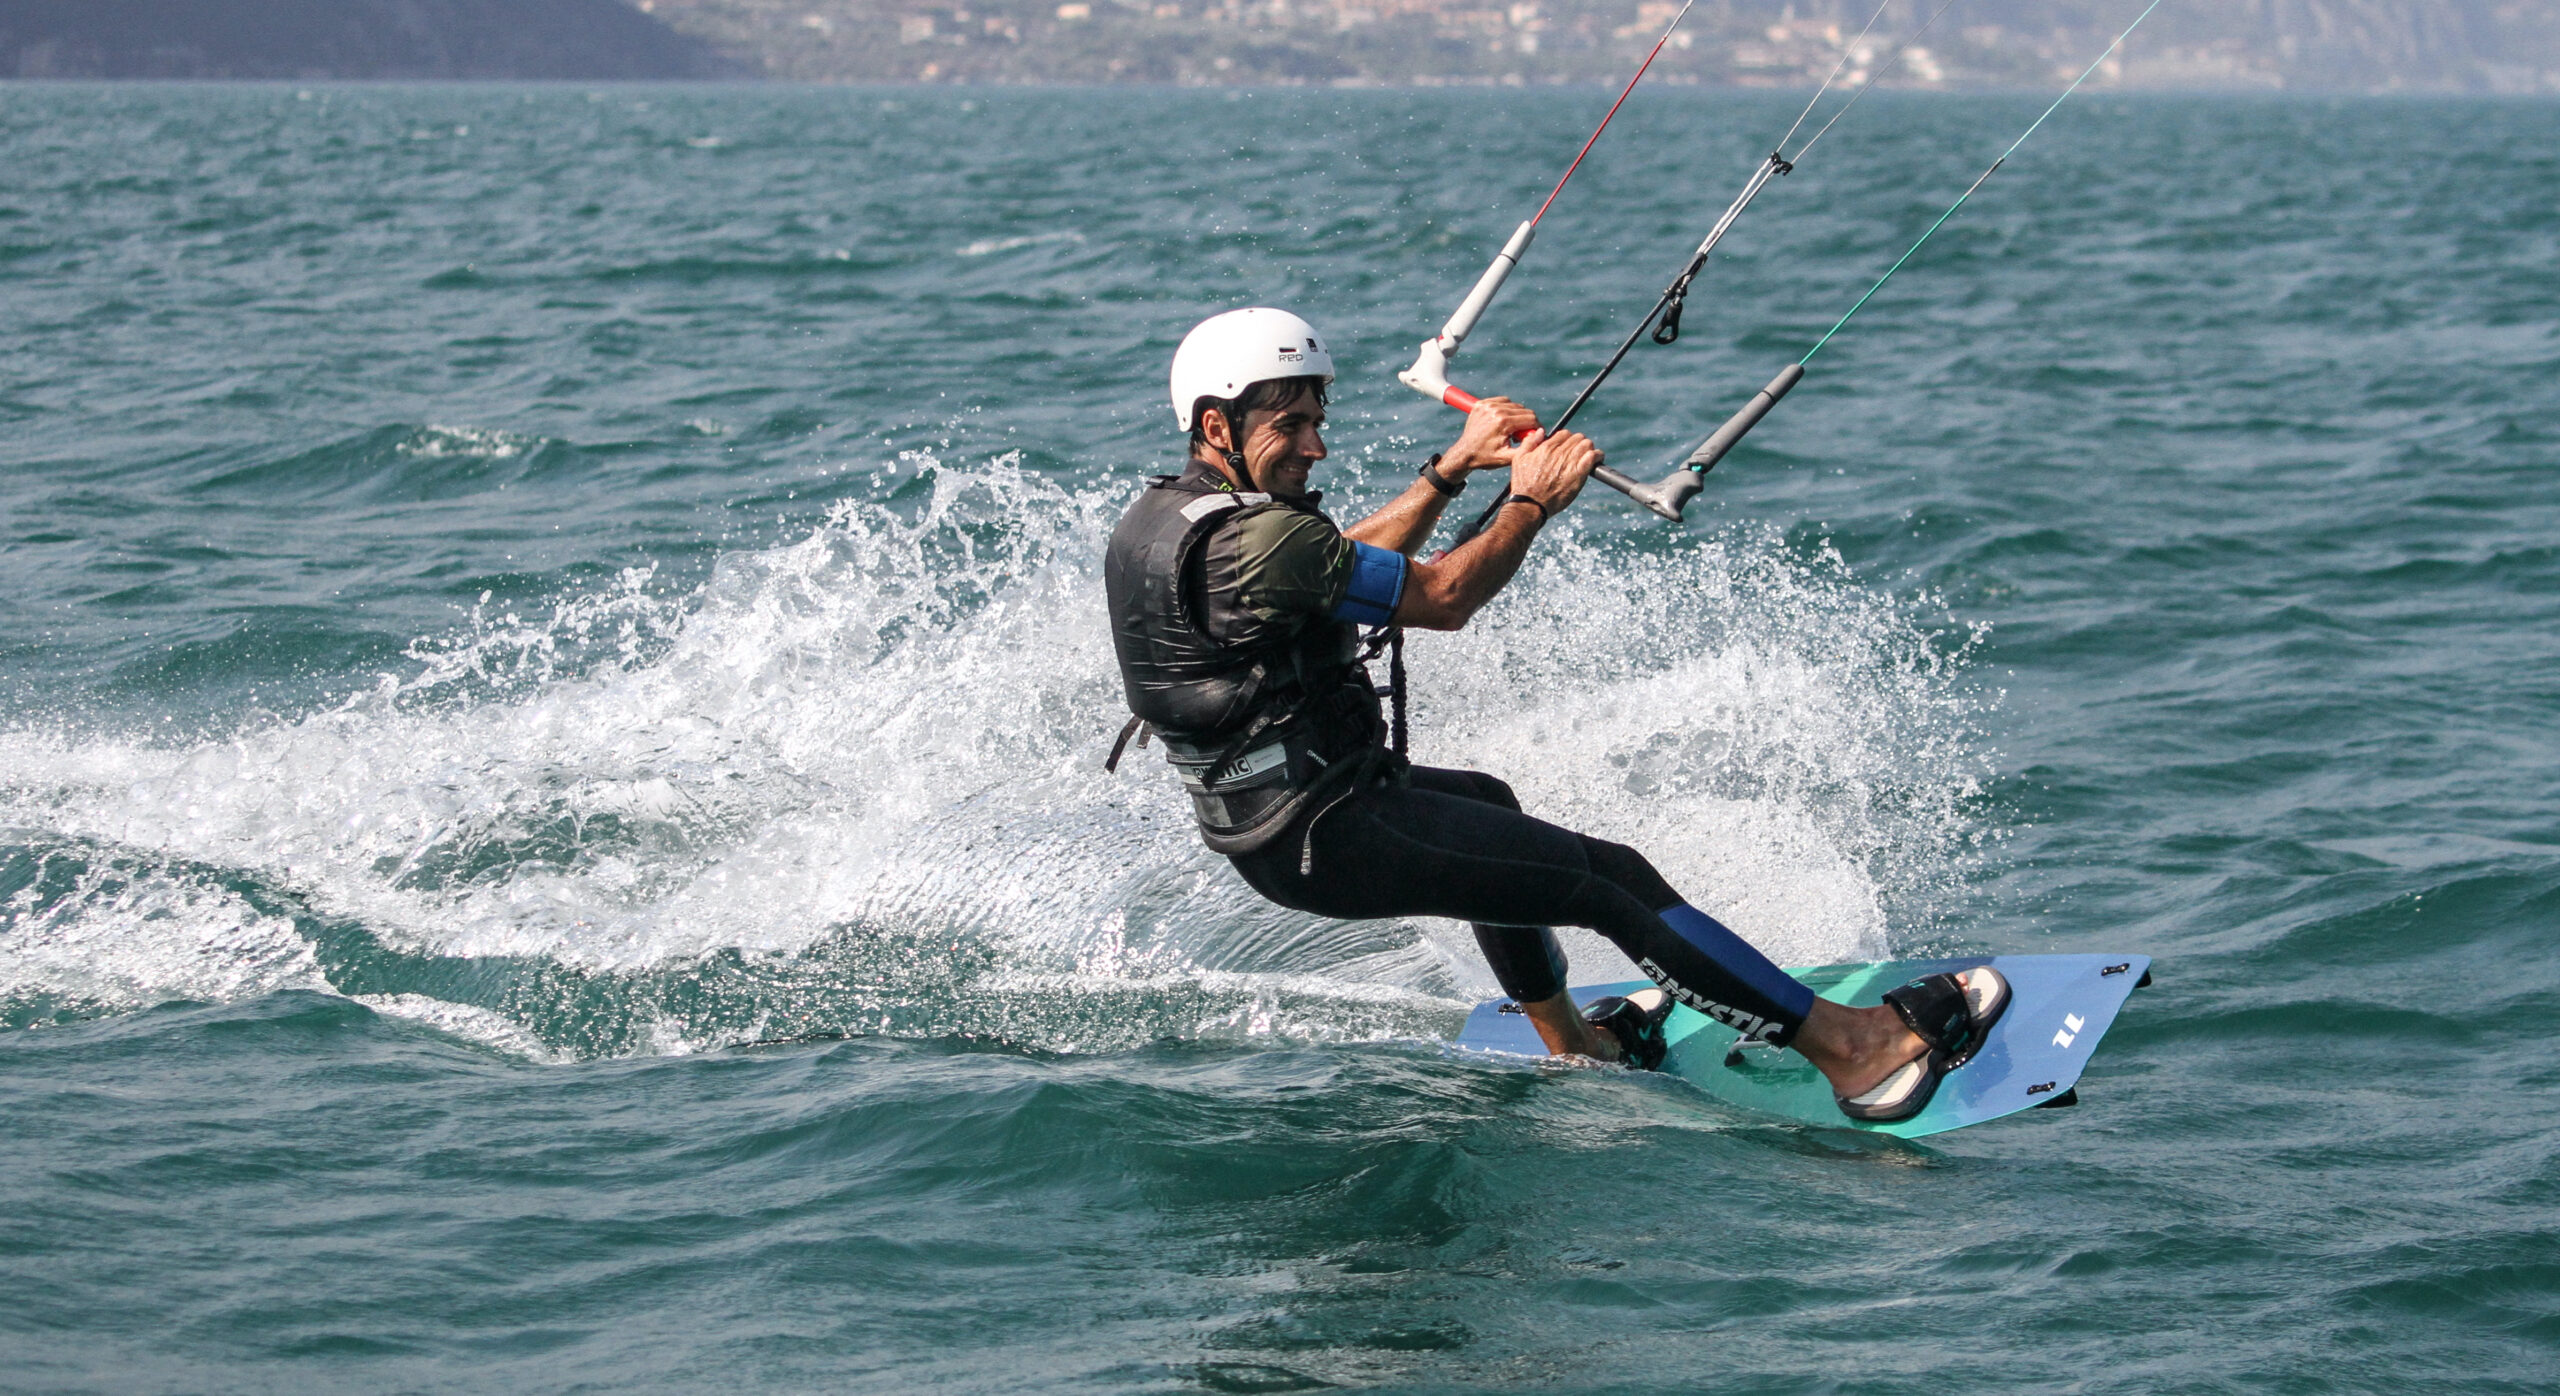 Corso base e partenze kitesurf